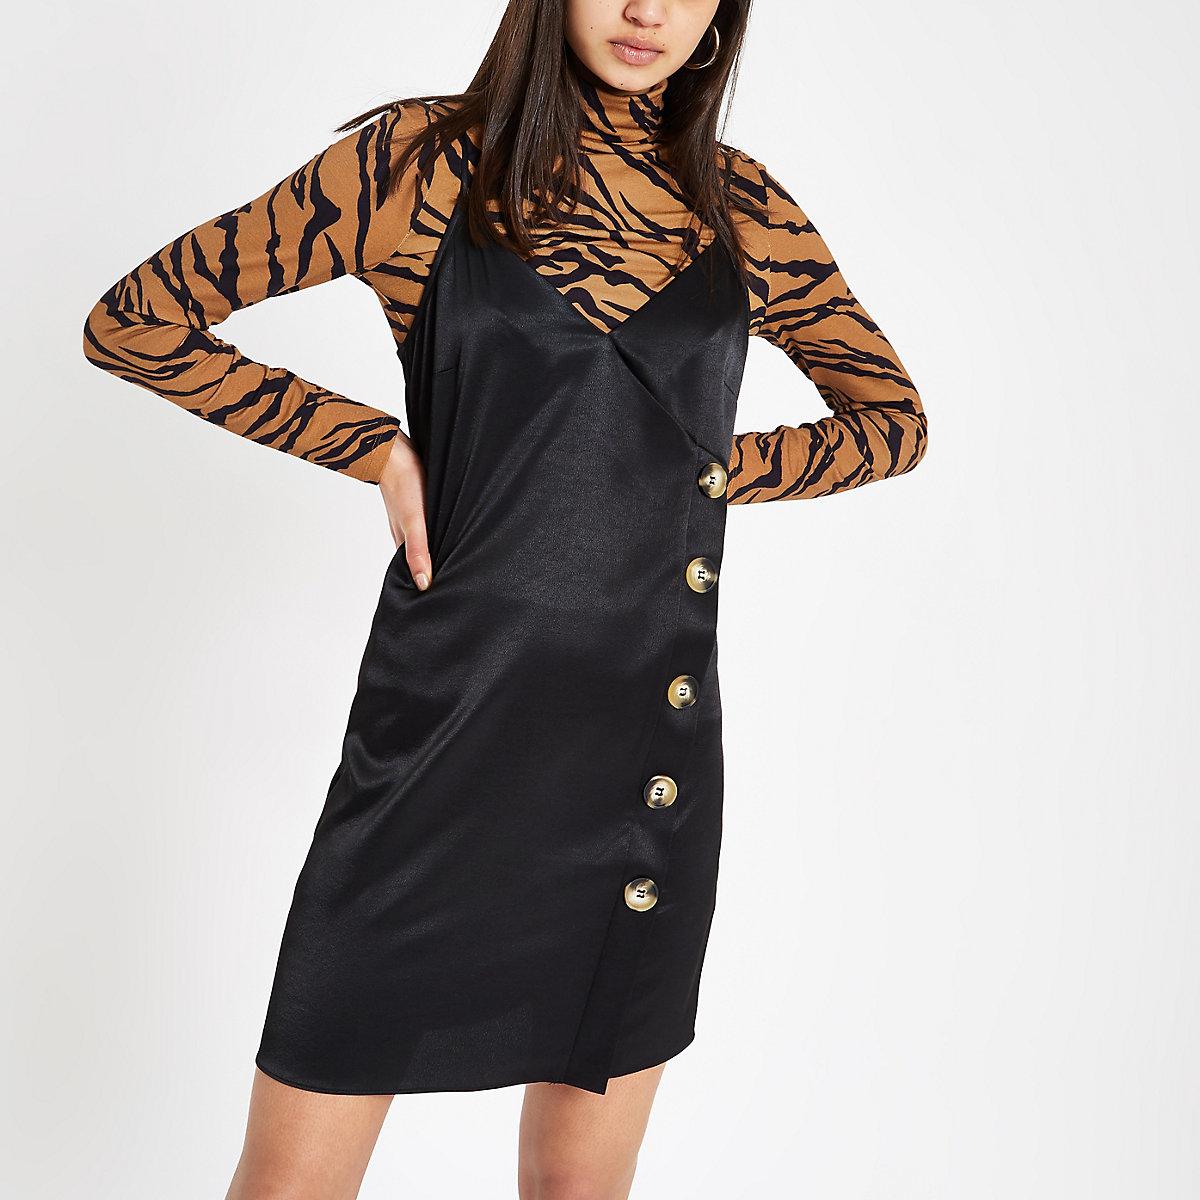 Black button side slip dress